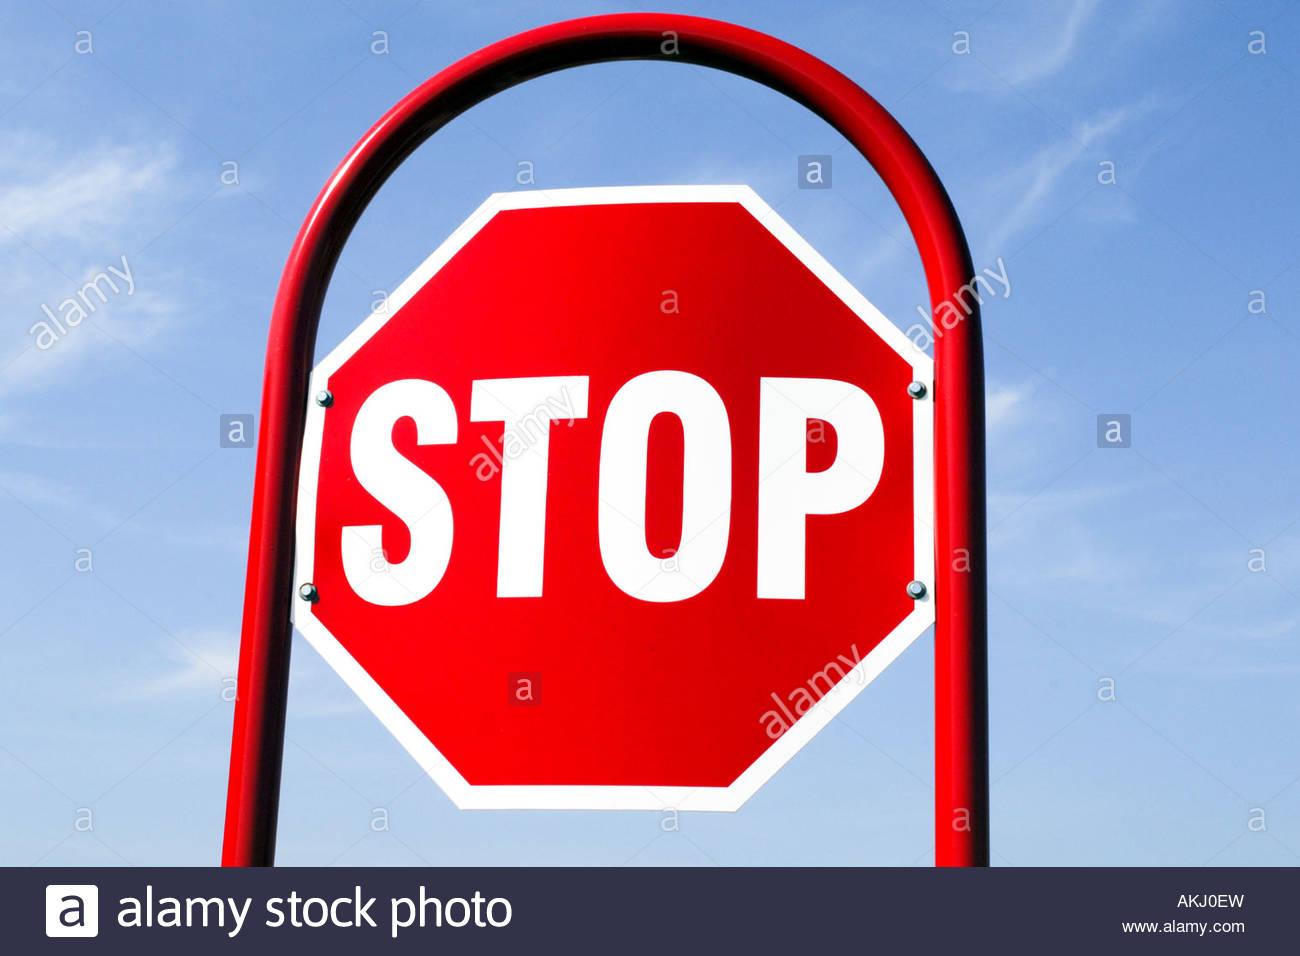 High Resolution Wallpaper   Stop Mi 1300x956 px